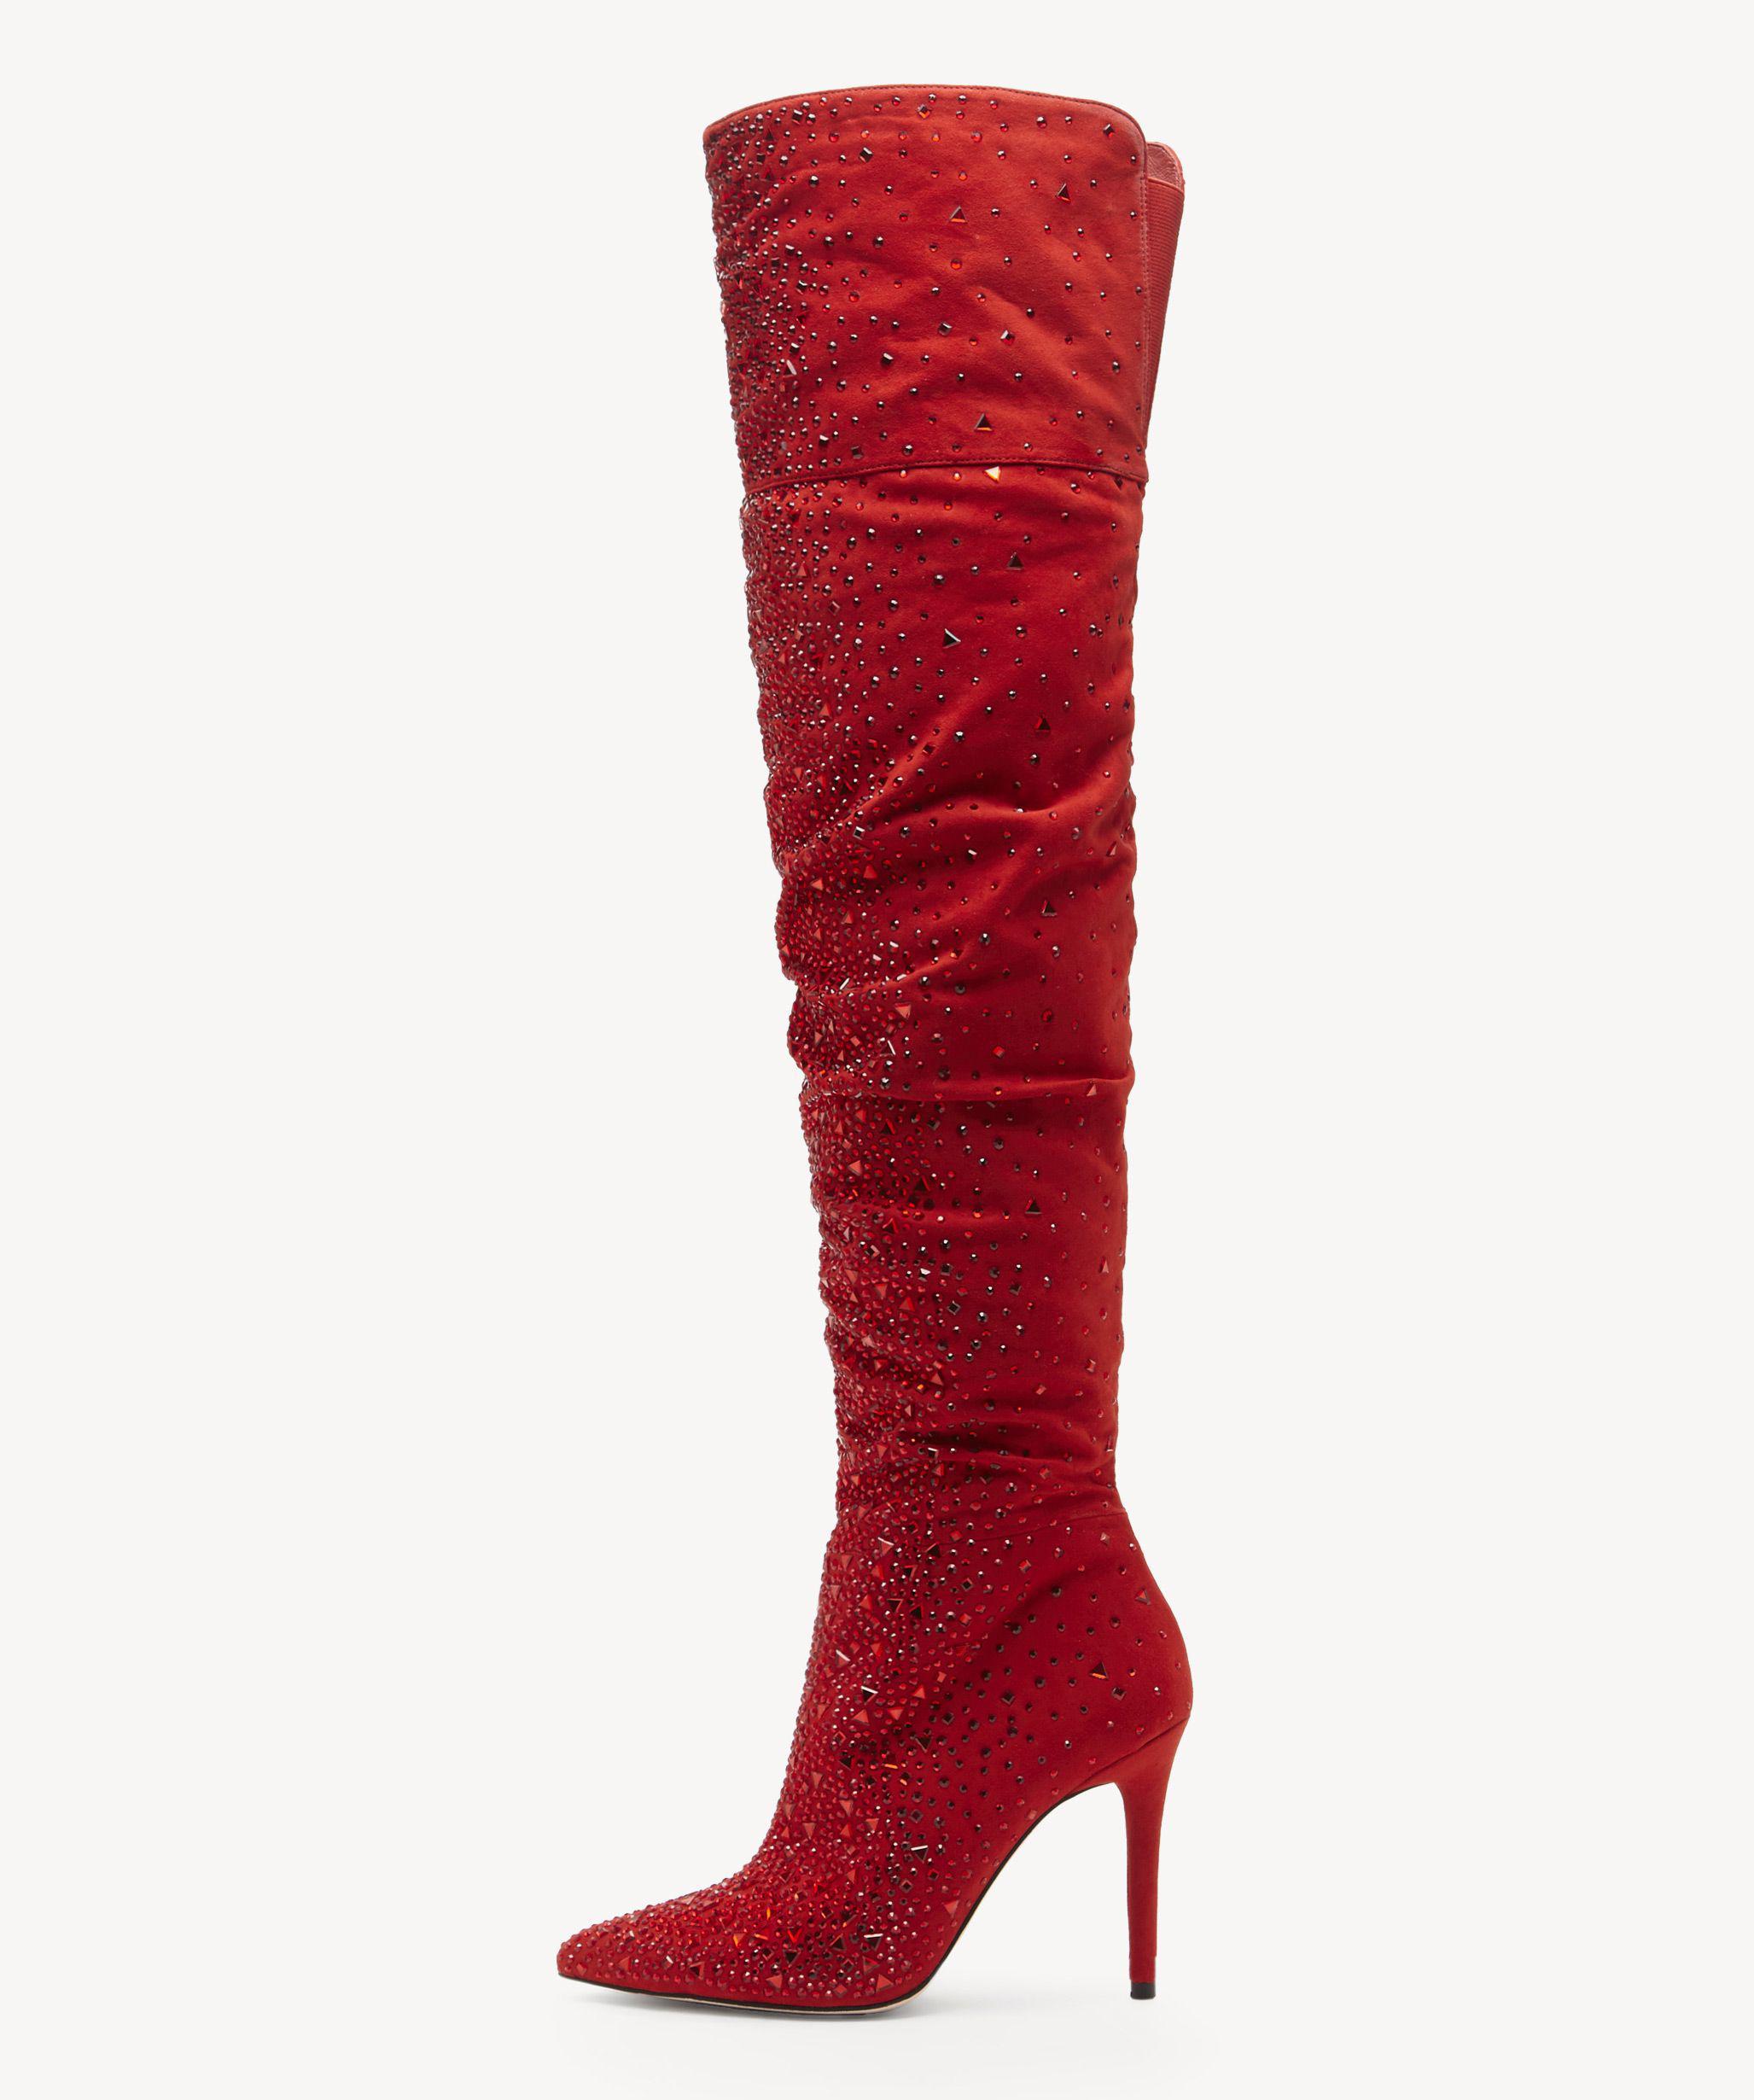 5f1eb8b4847 Jessica Simpson - Red Luxella - Lyst. View fullscreen